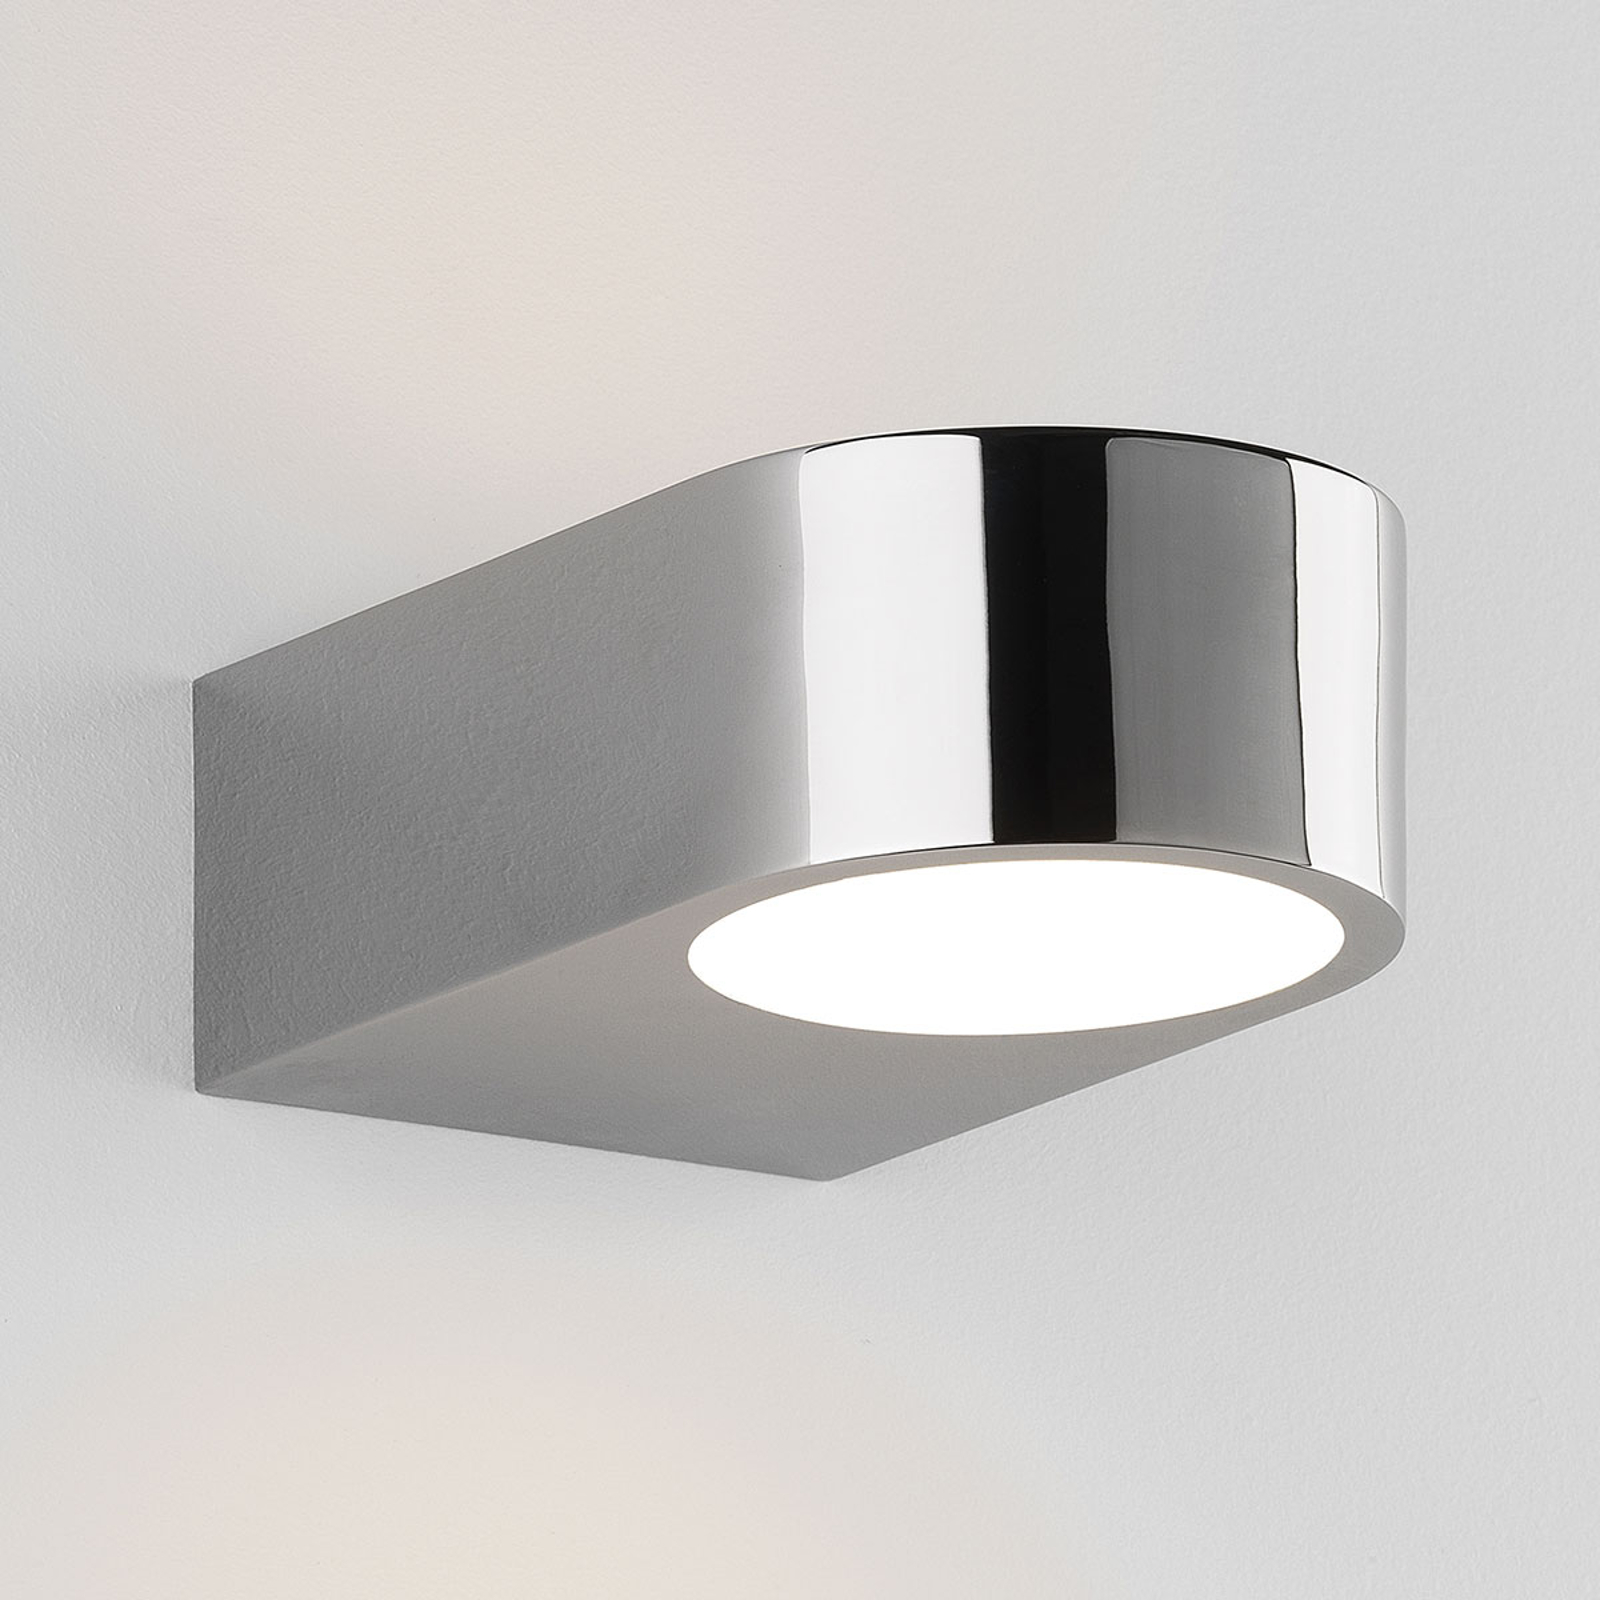 Astro Epsilon applique de salle de bain avec LED